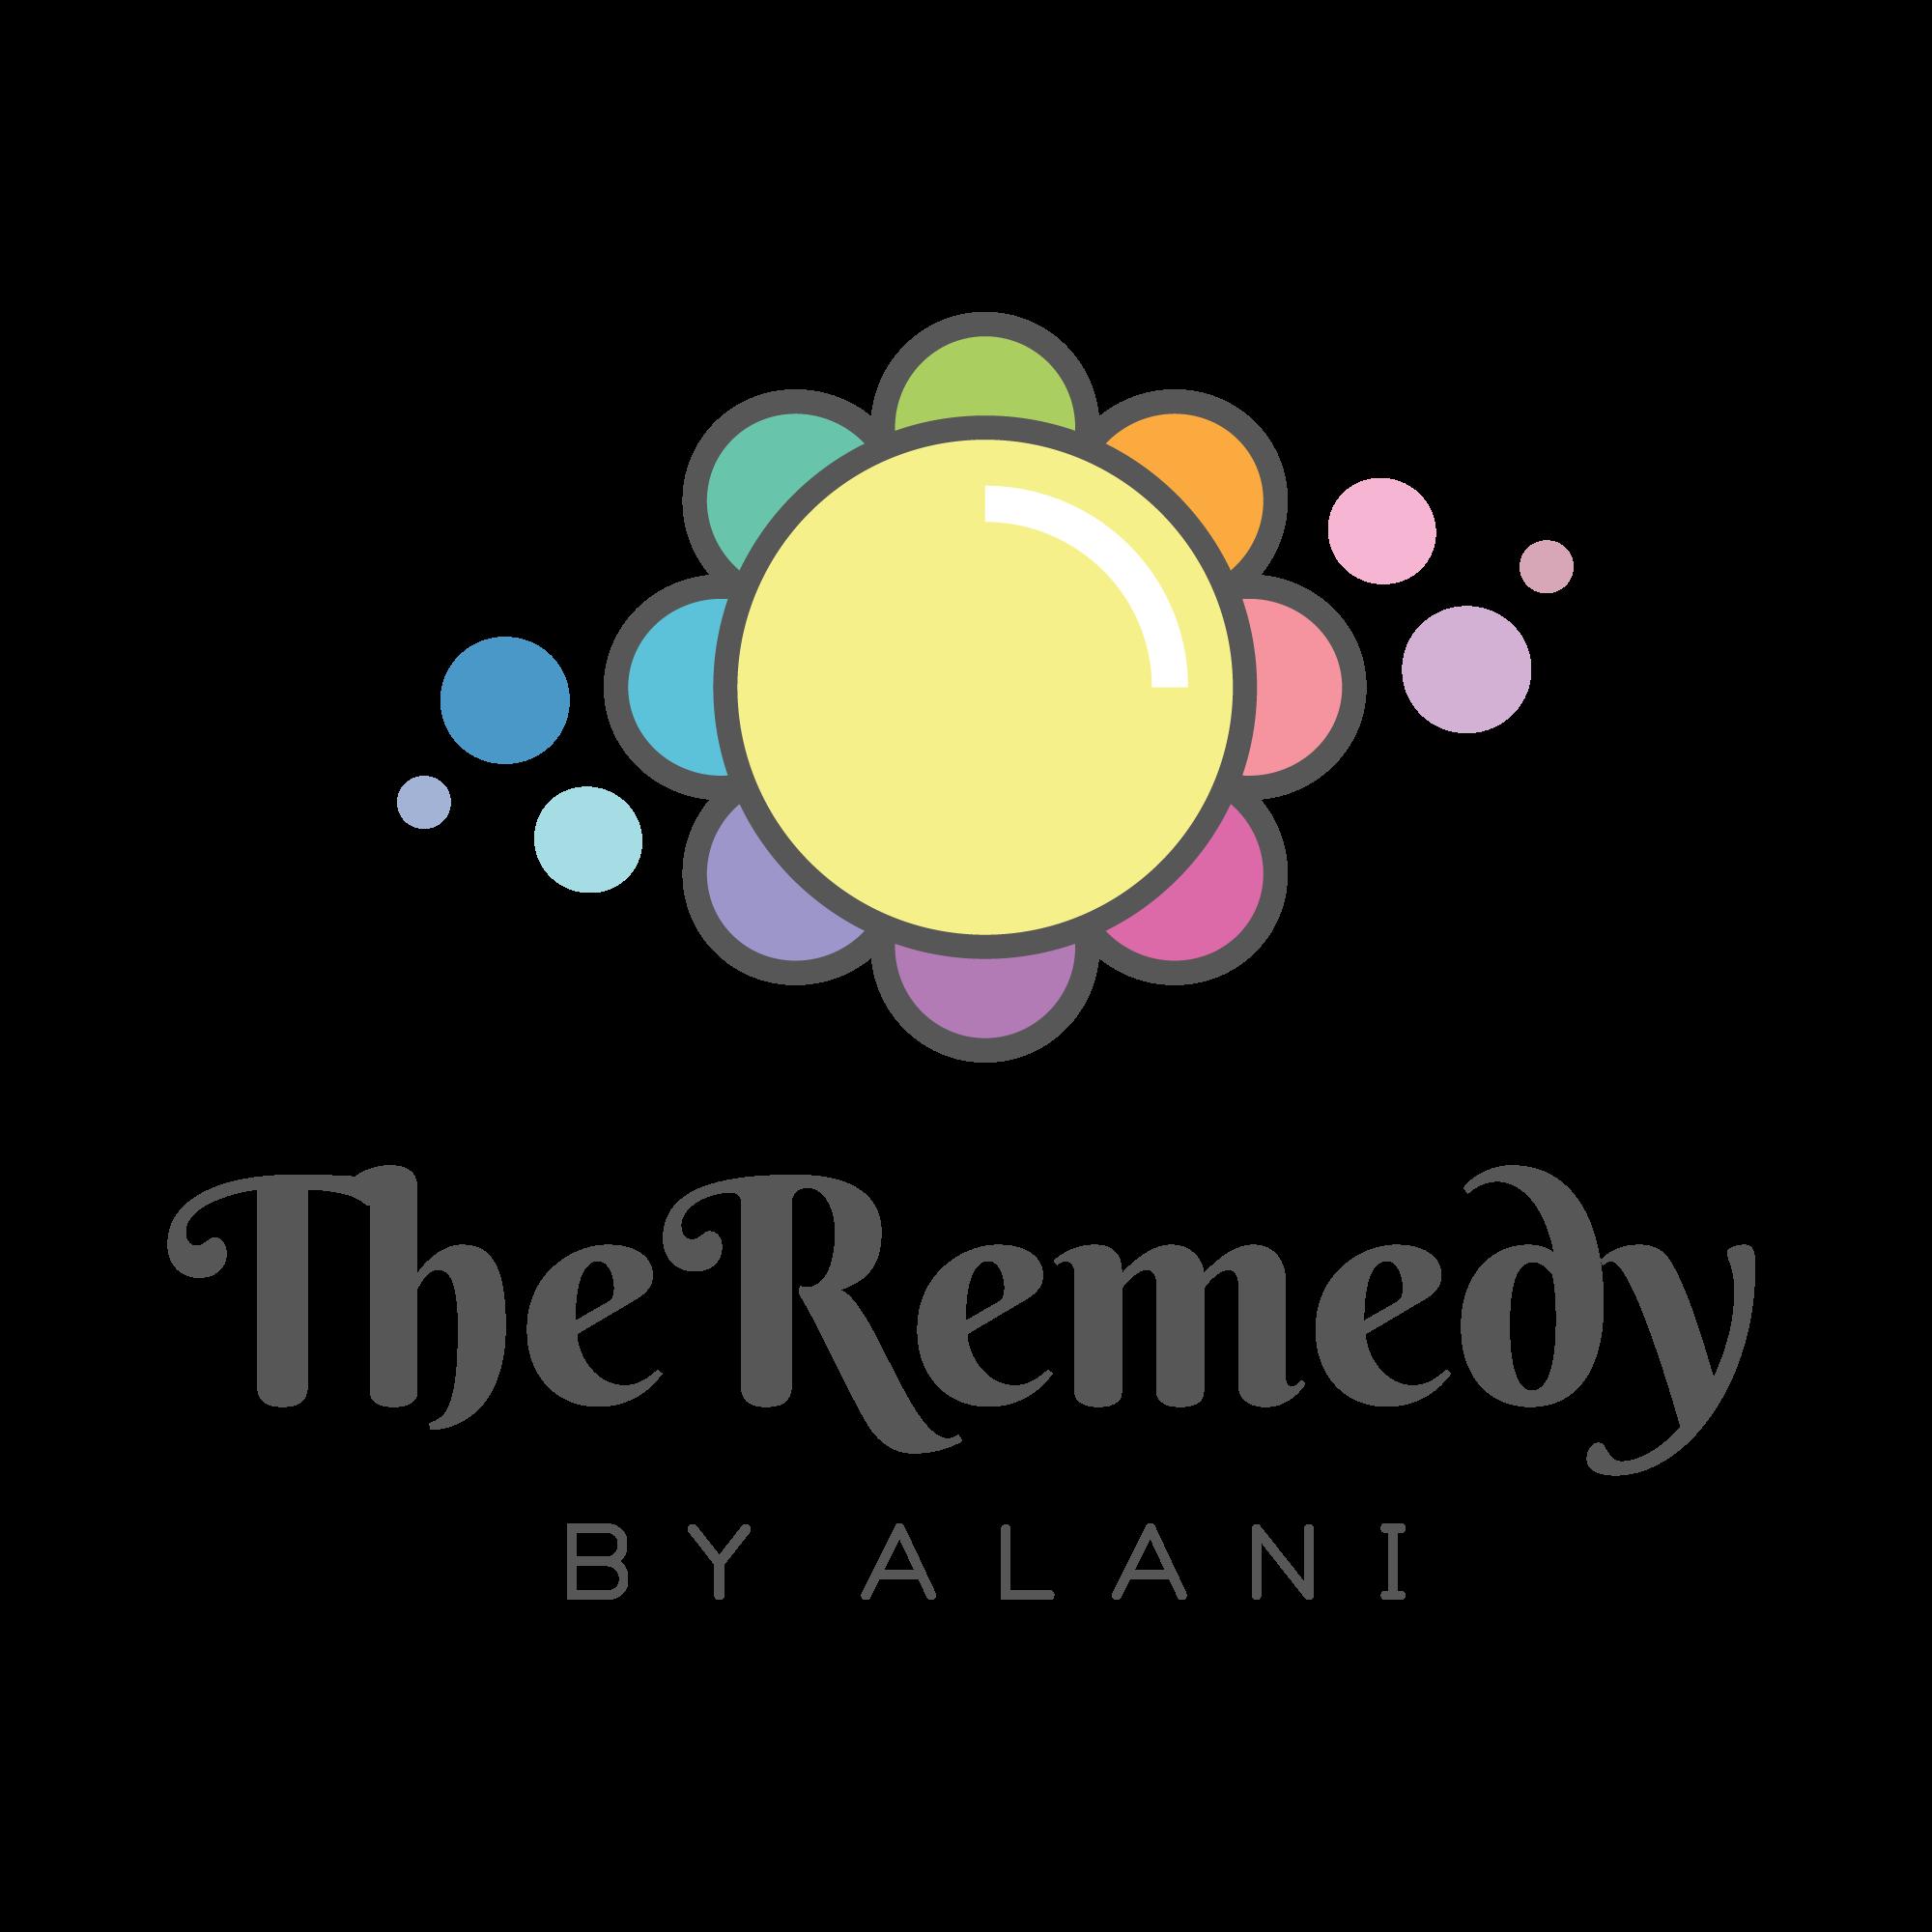 Design an inviting logo for Eczema skin care brand